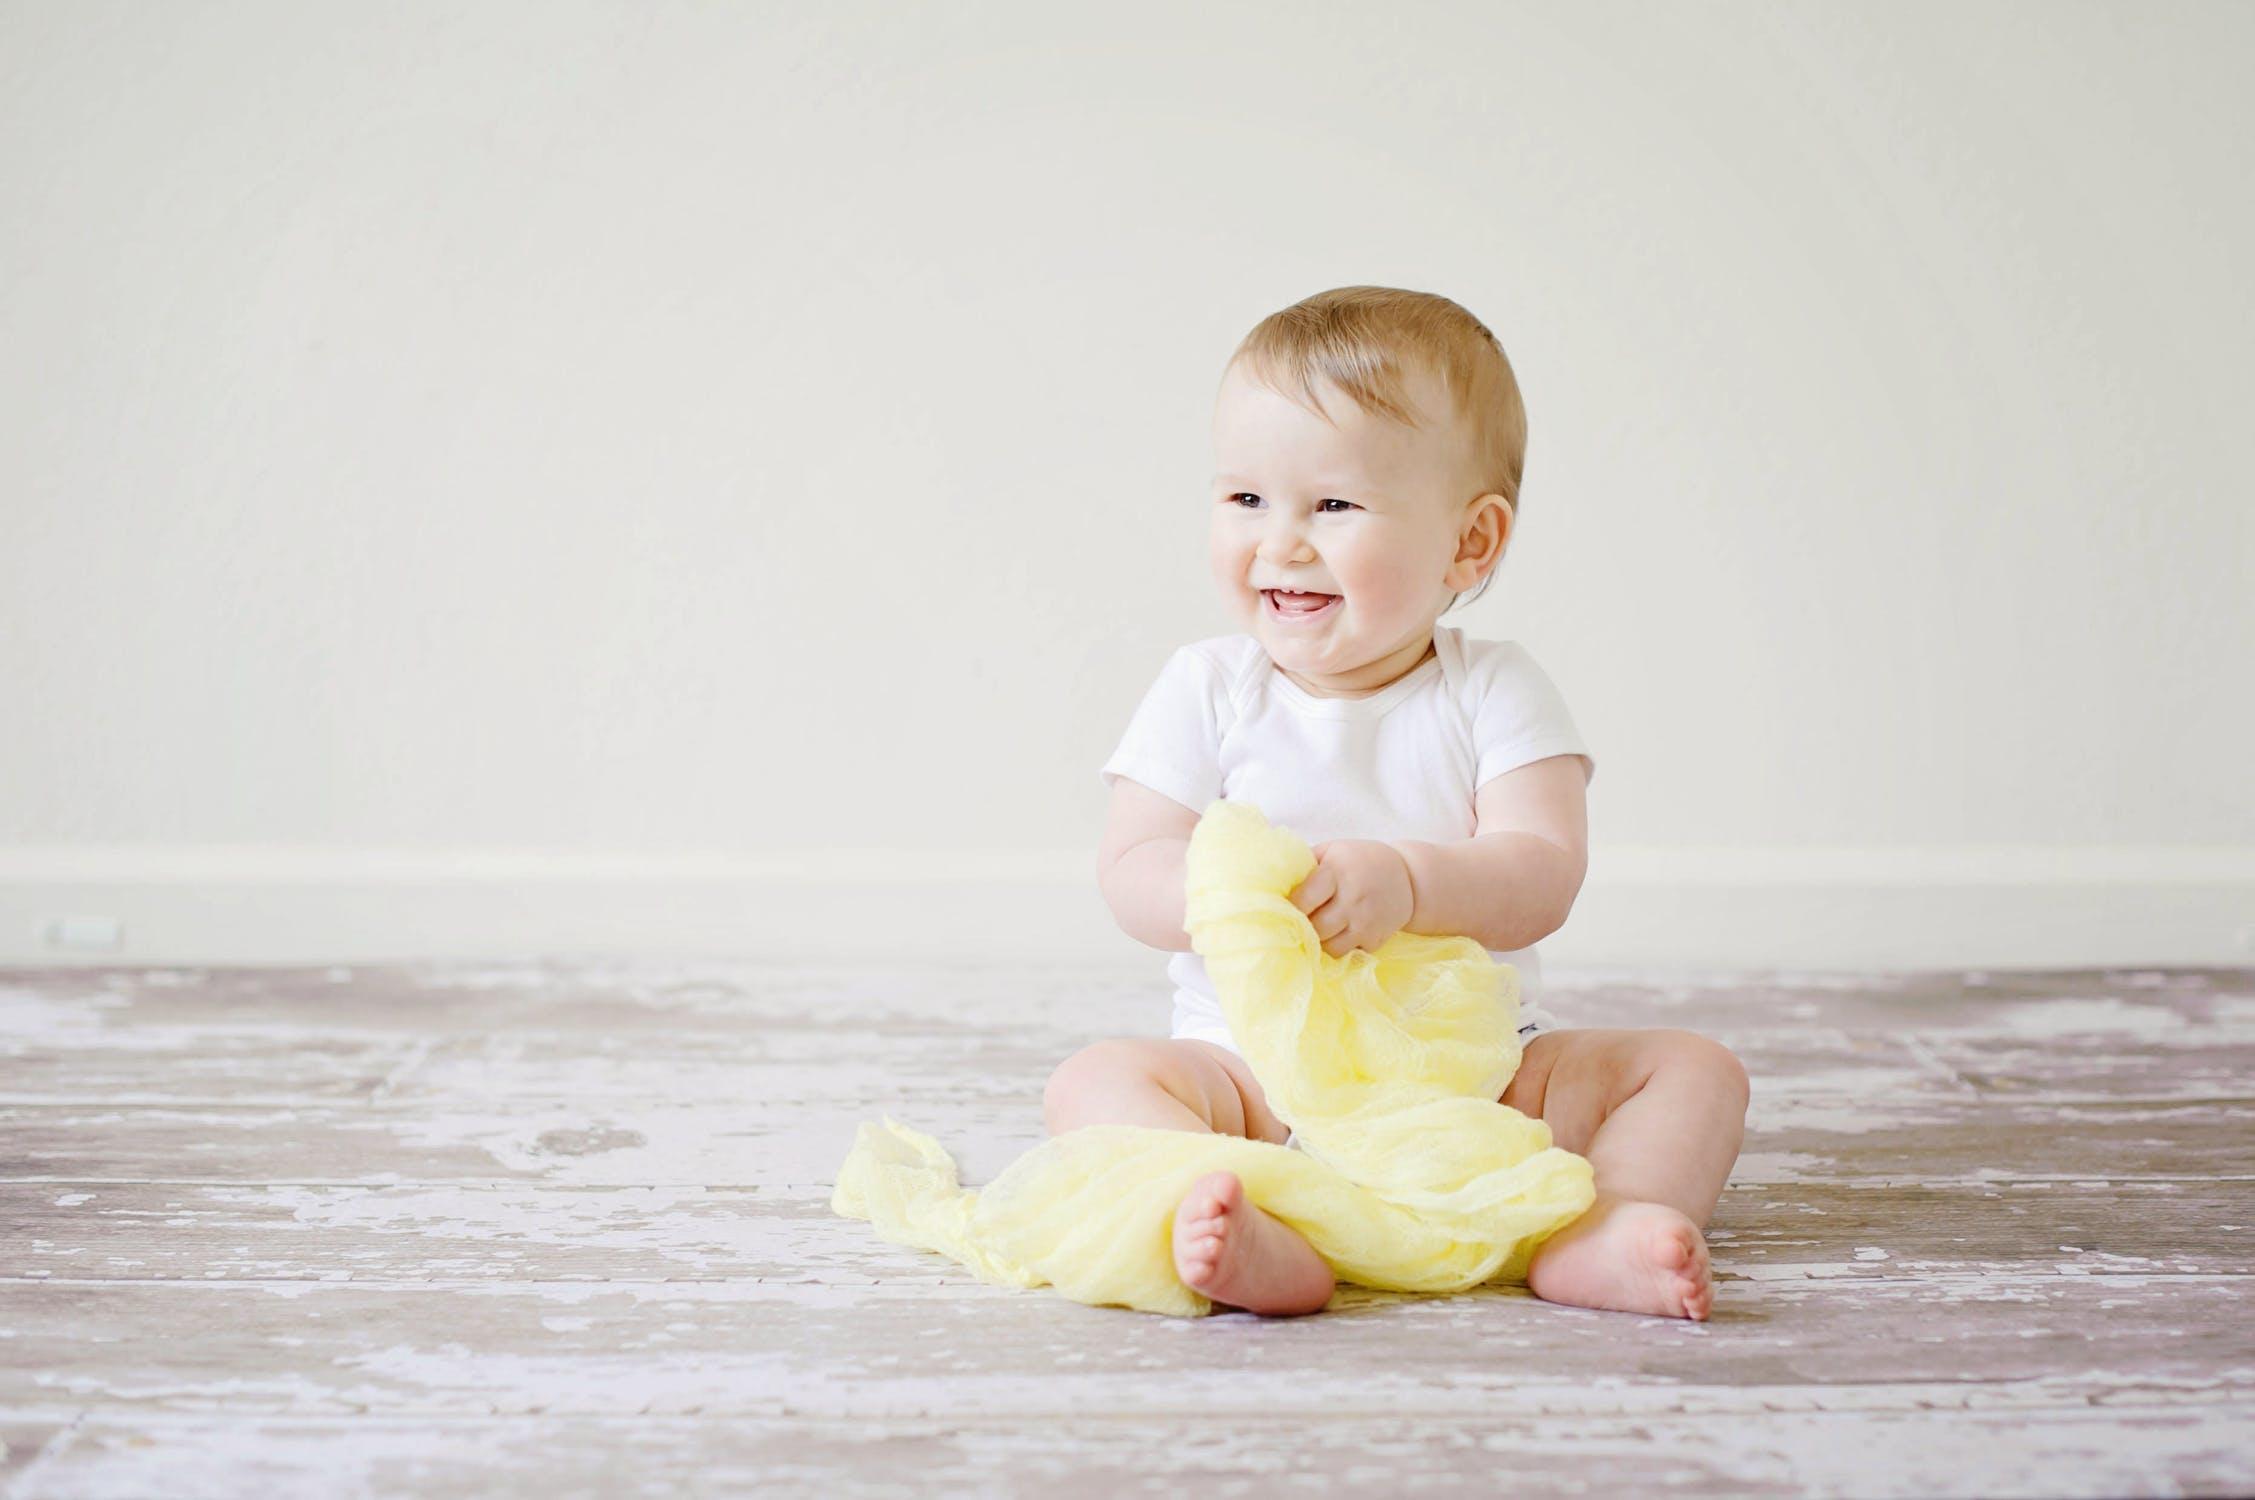 Encouraging baby development